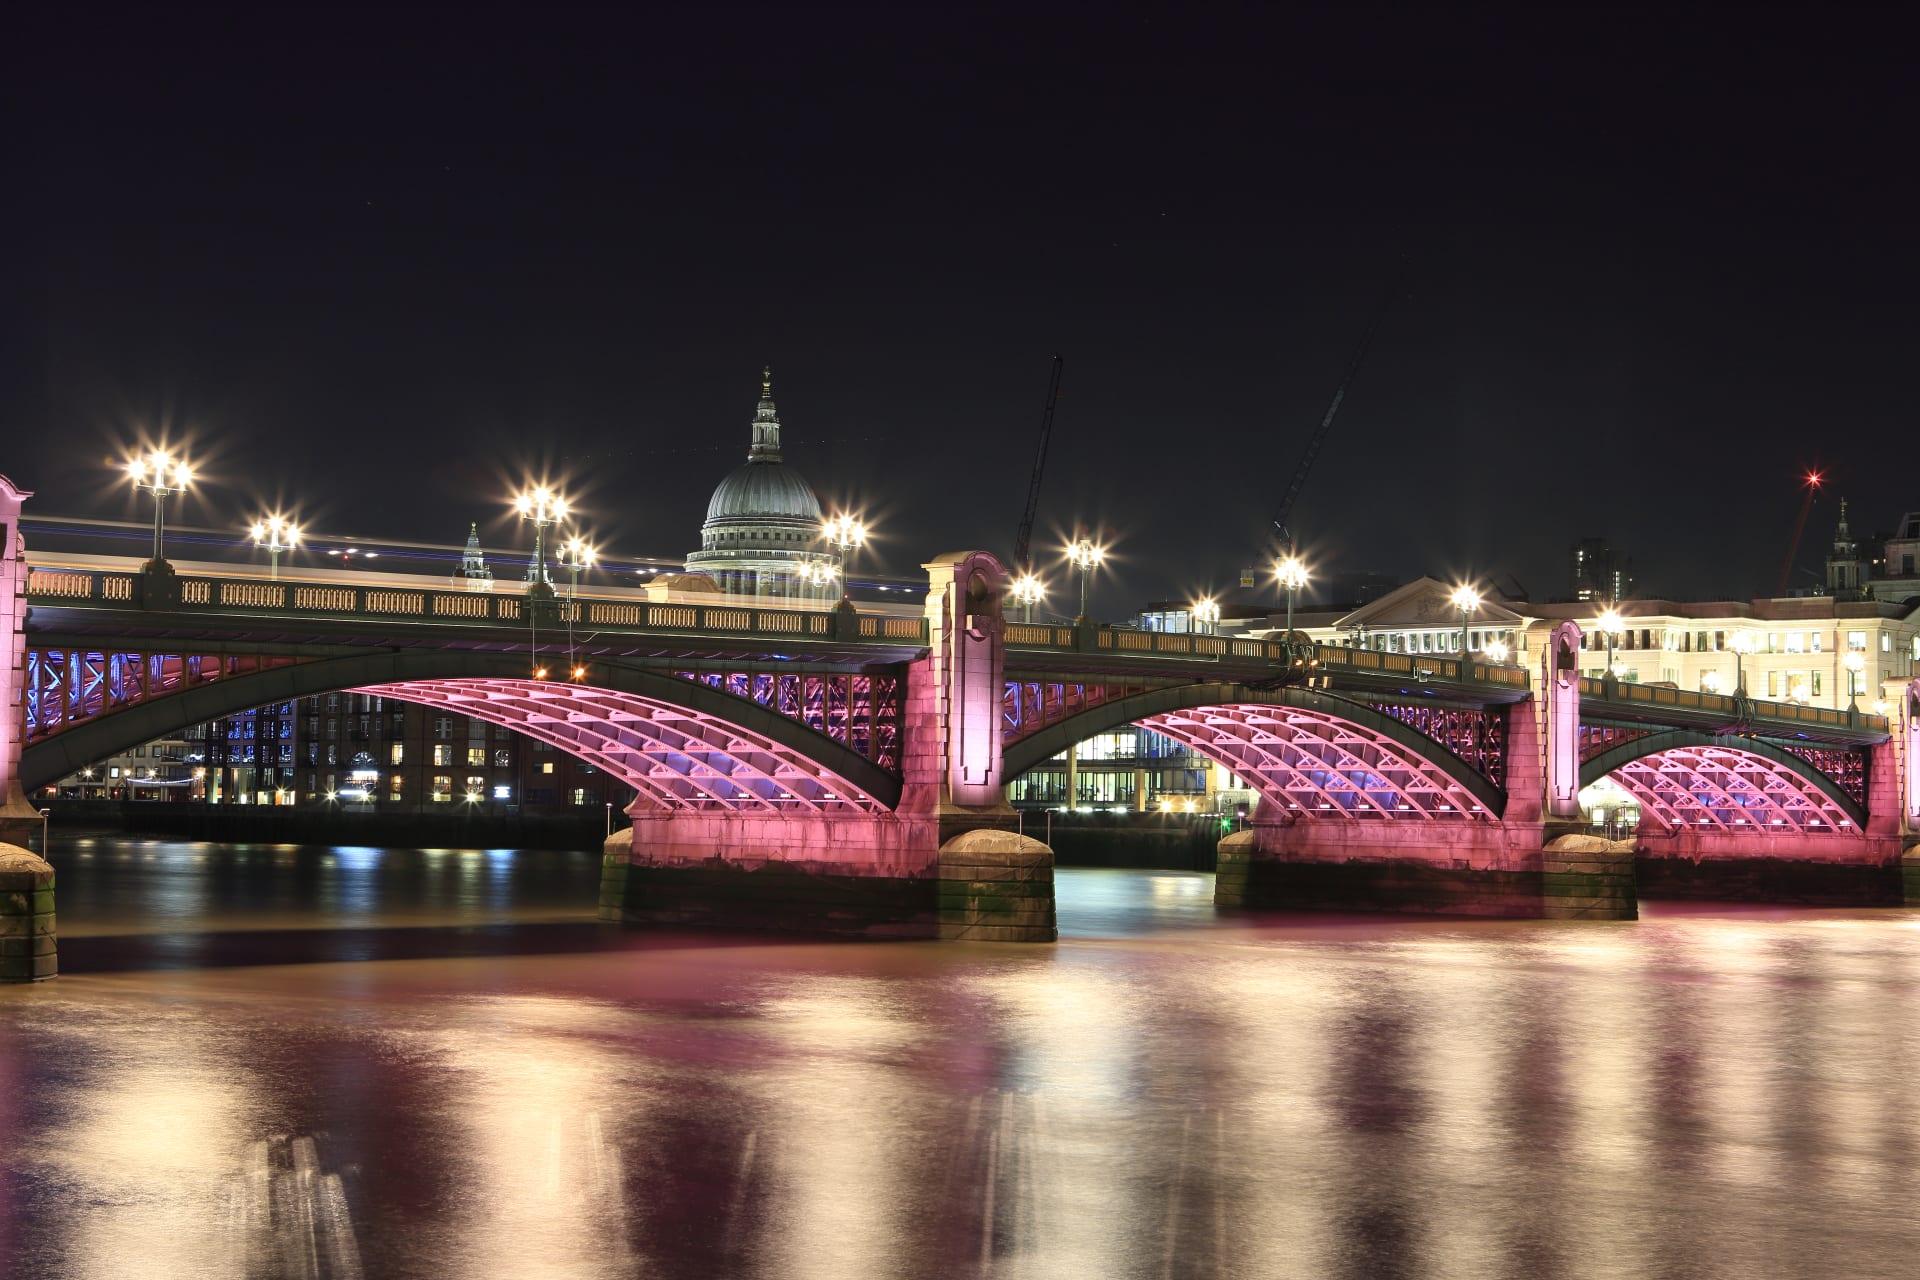 London - Illuminated River - London's Thames by night.